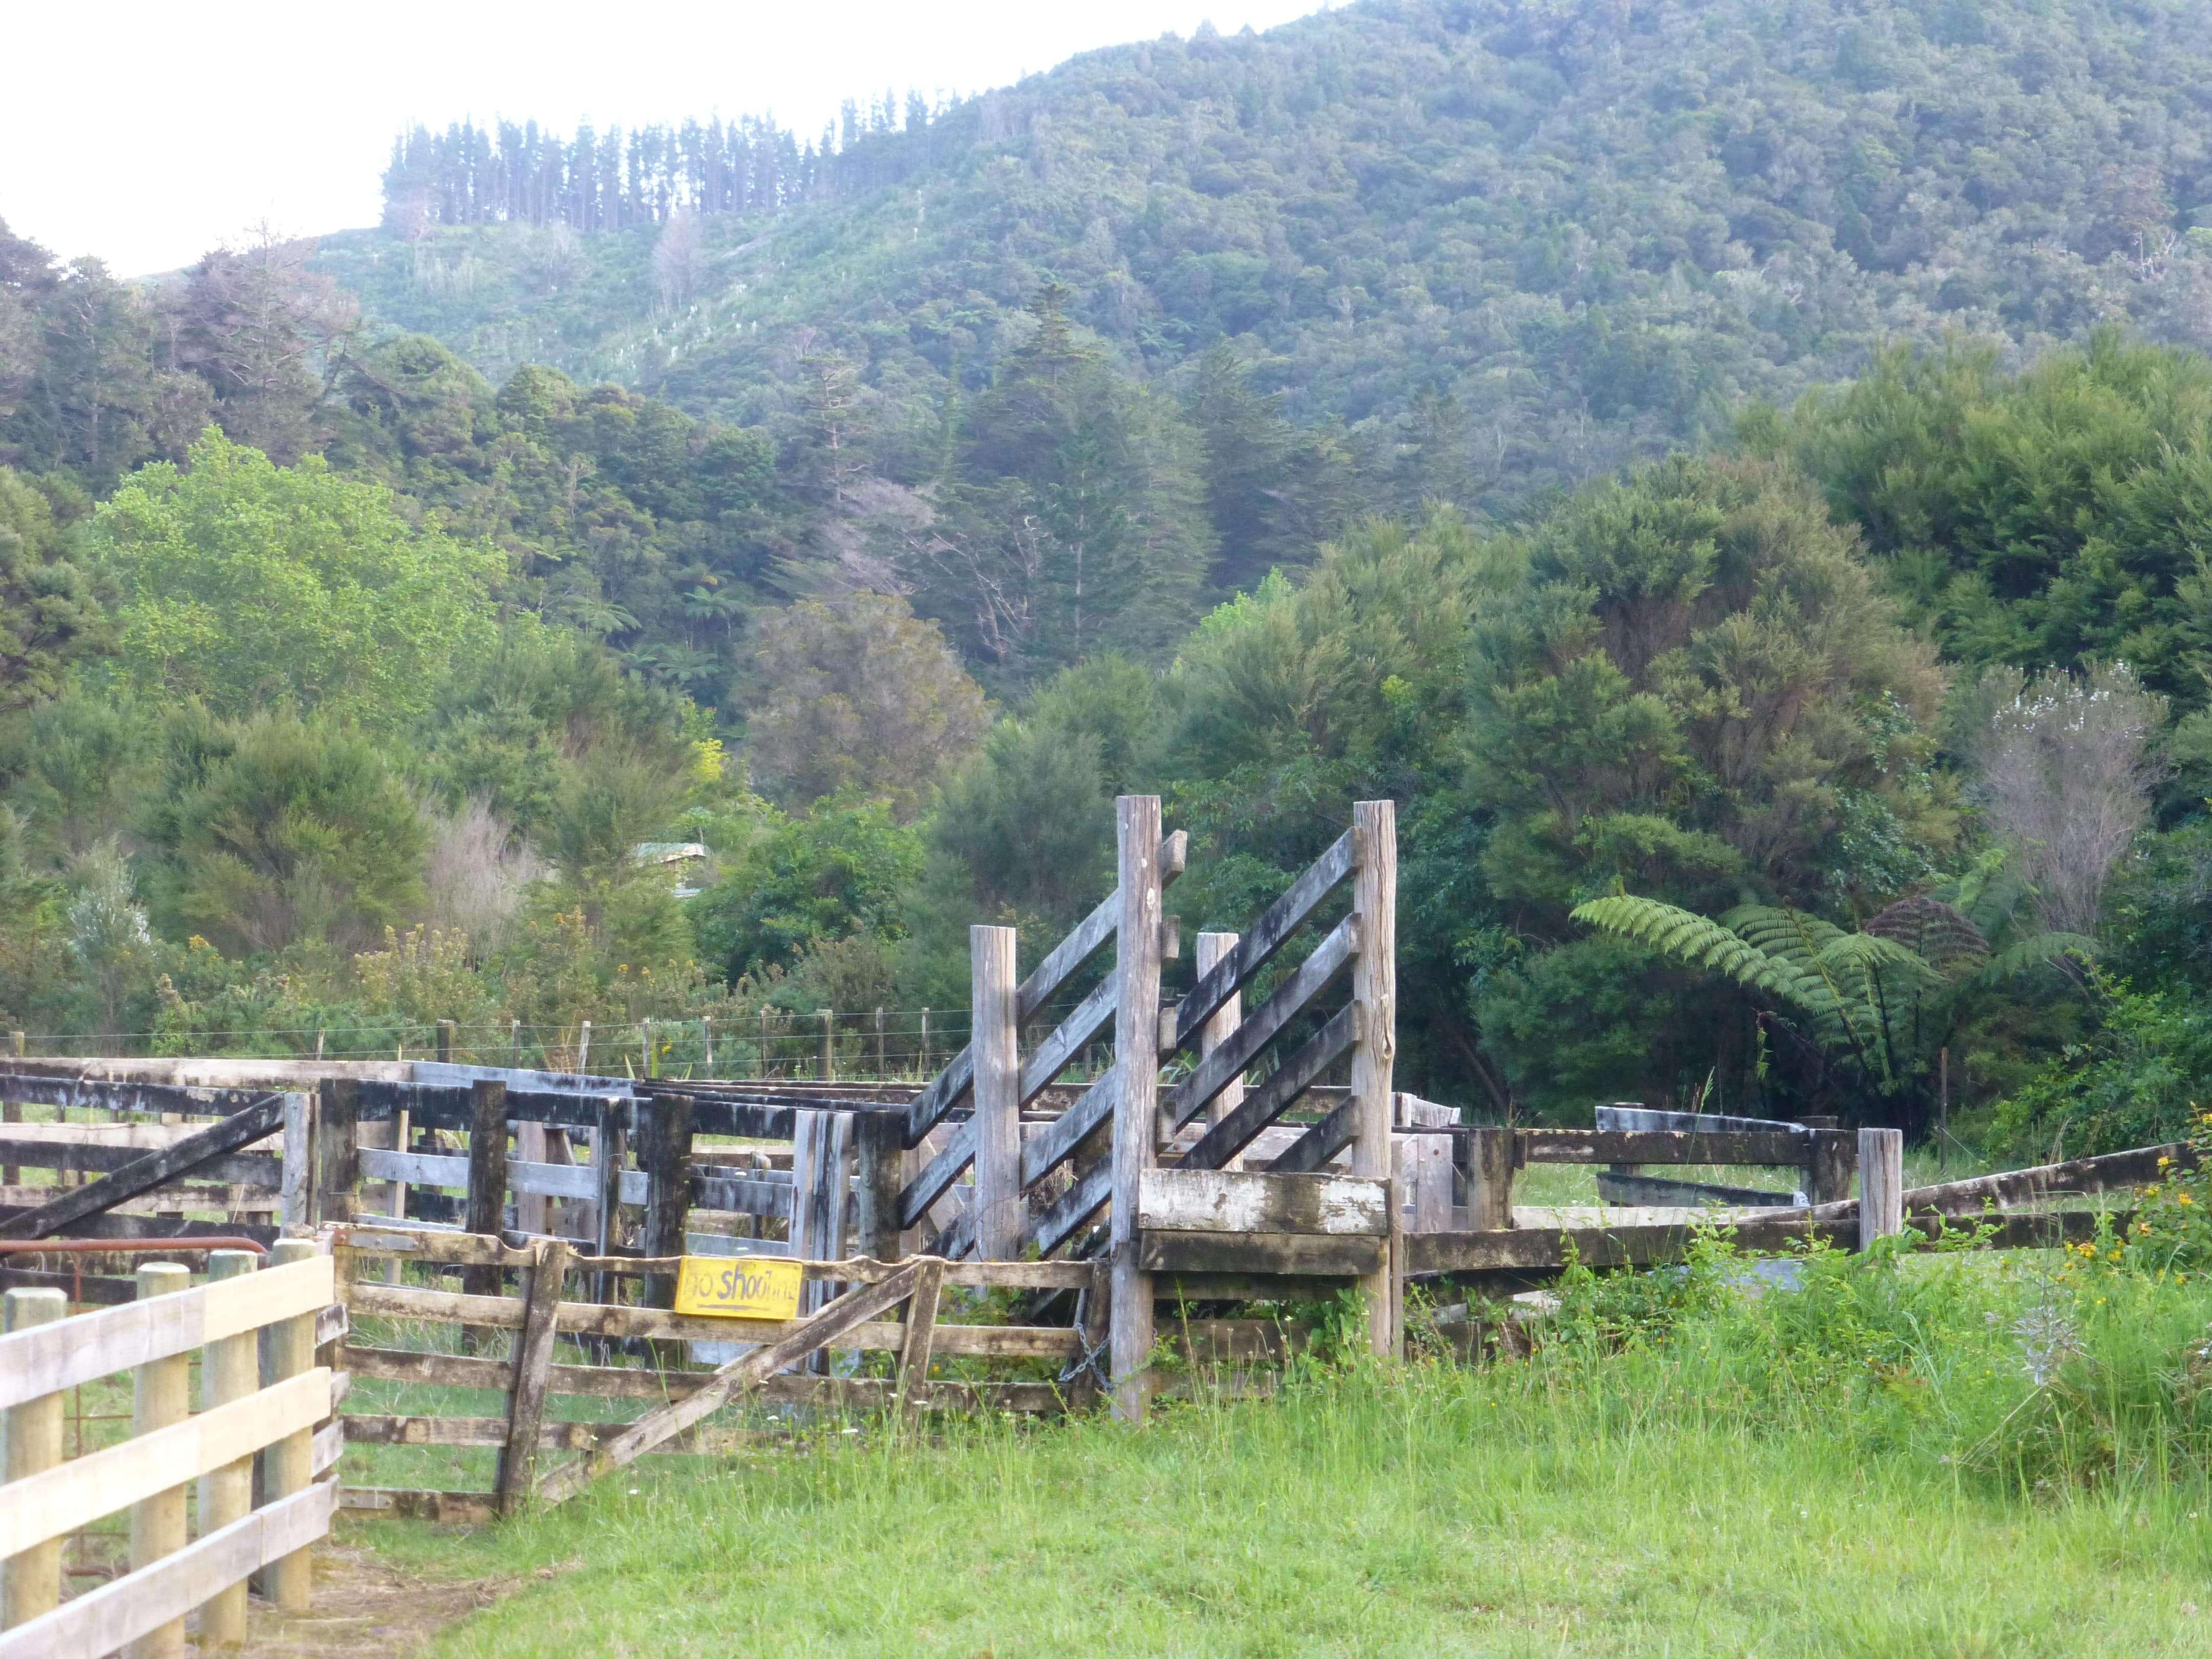 Raetea Camping Area 7